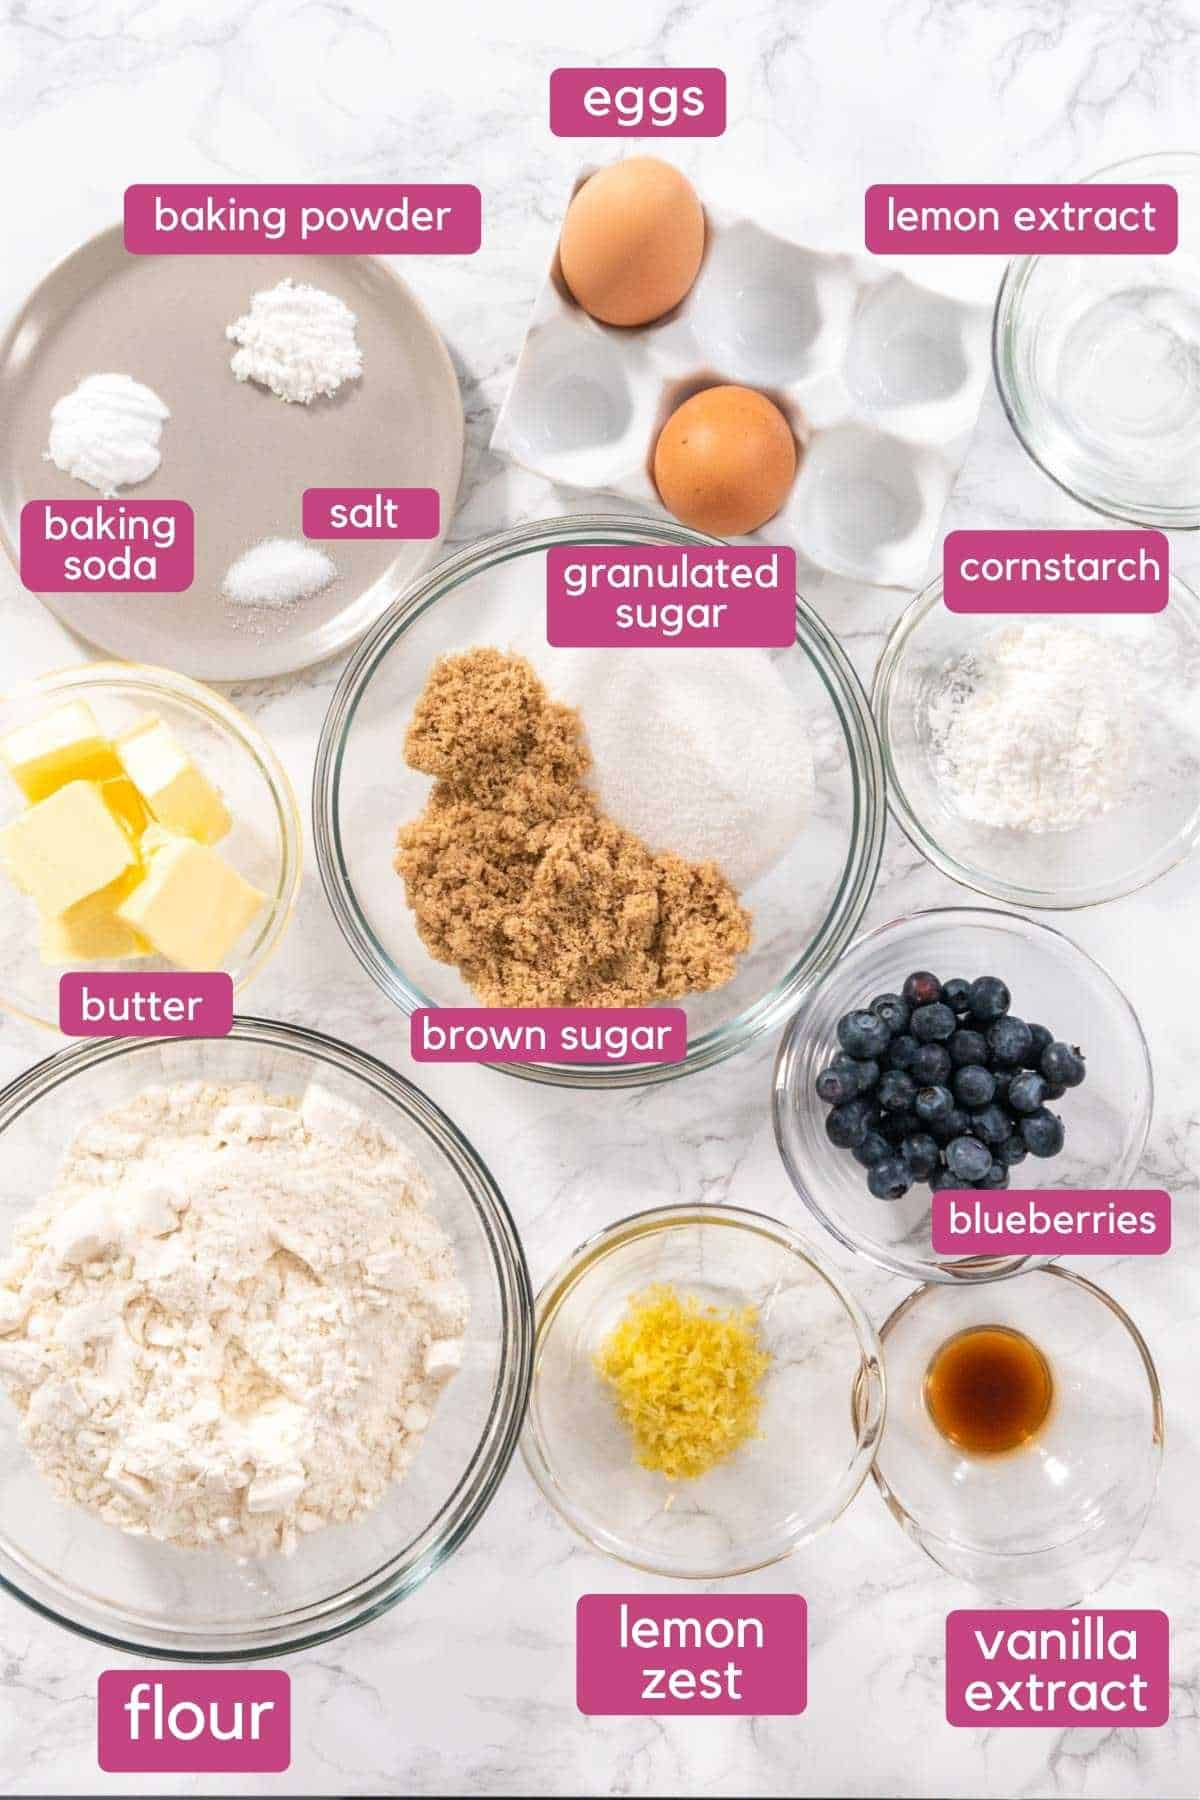 Ingredients to make blueberry lemon cookies.